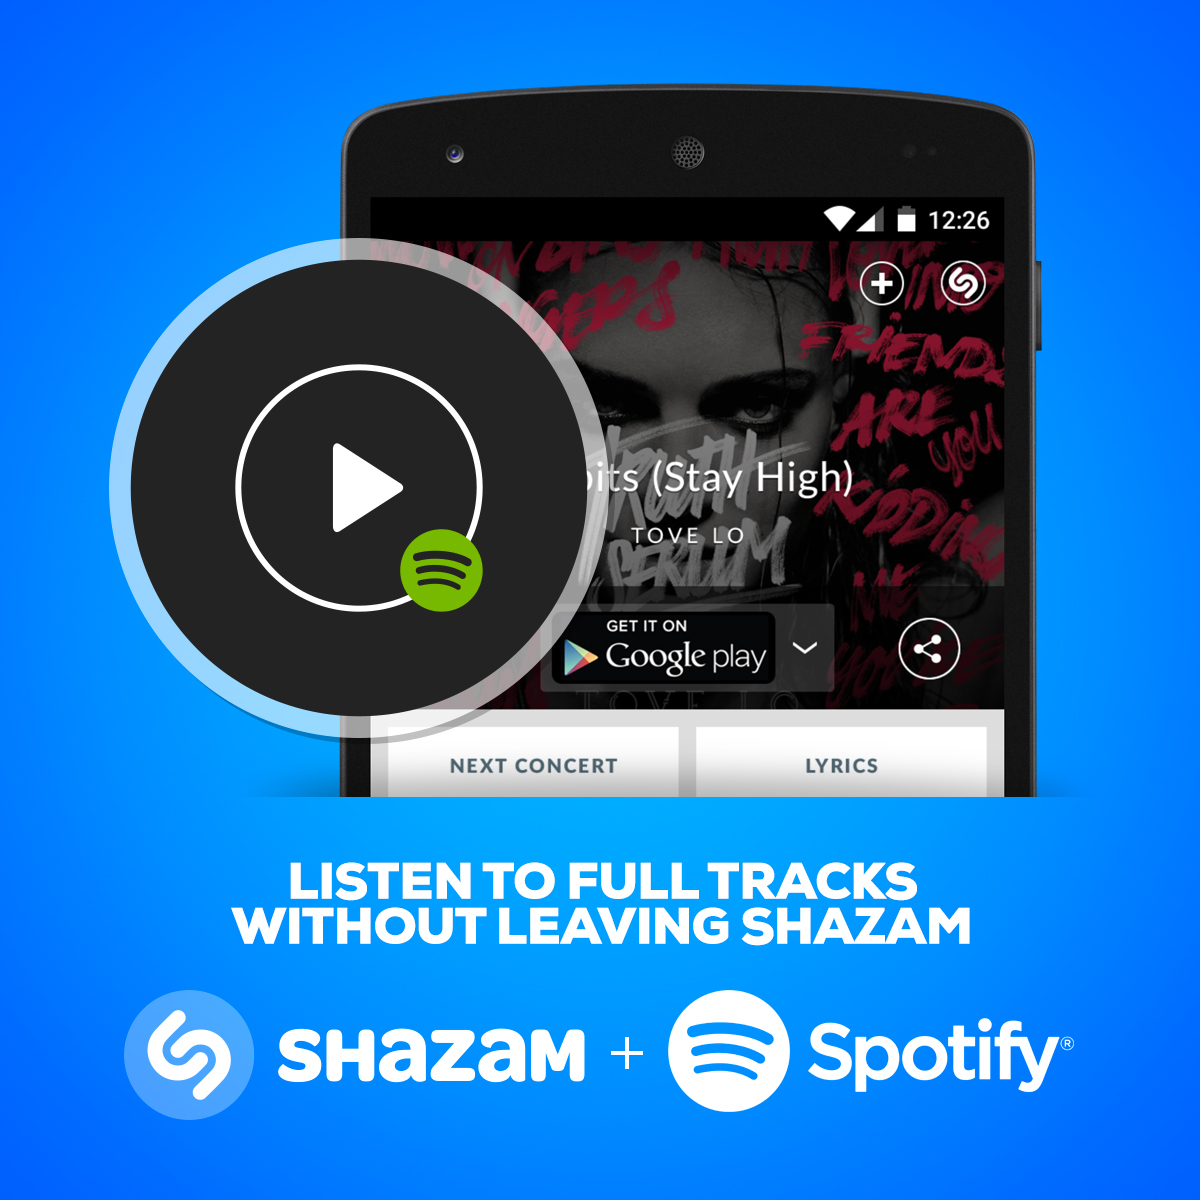 SZ_Spotify_Social_1200x1200.jpg